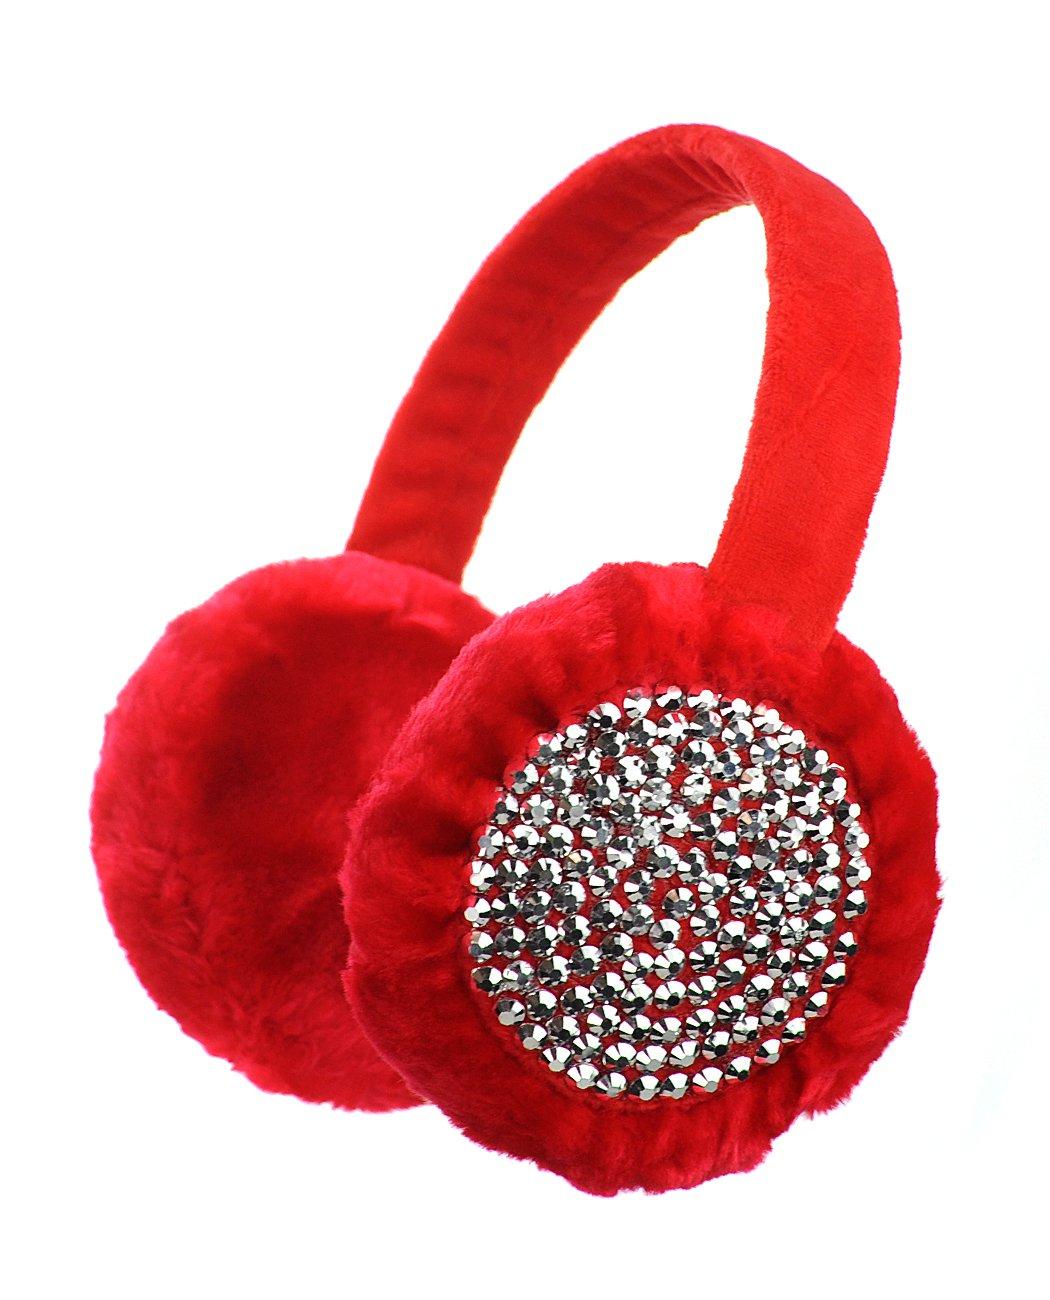 Solid Color Soft Faux Fur Warm Earmuffs w/ Rhinestone Studded Accents - White NYFASHION101 JM6068-SVWHT